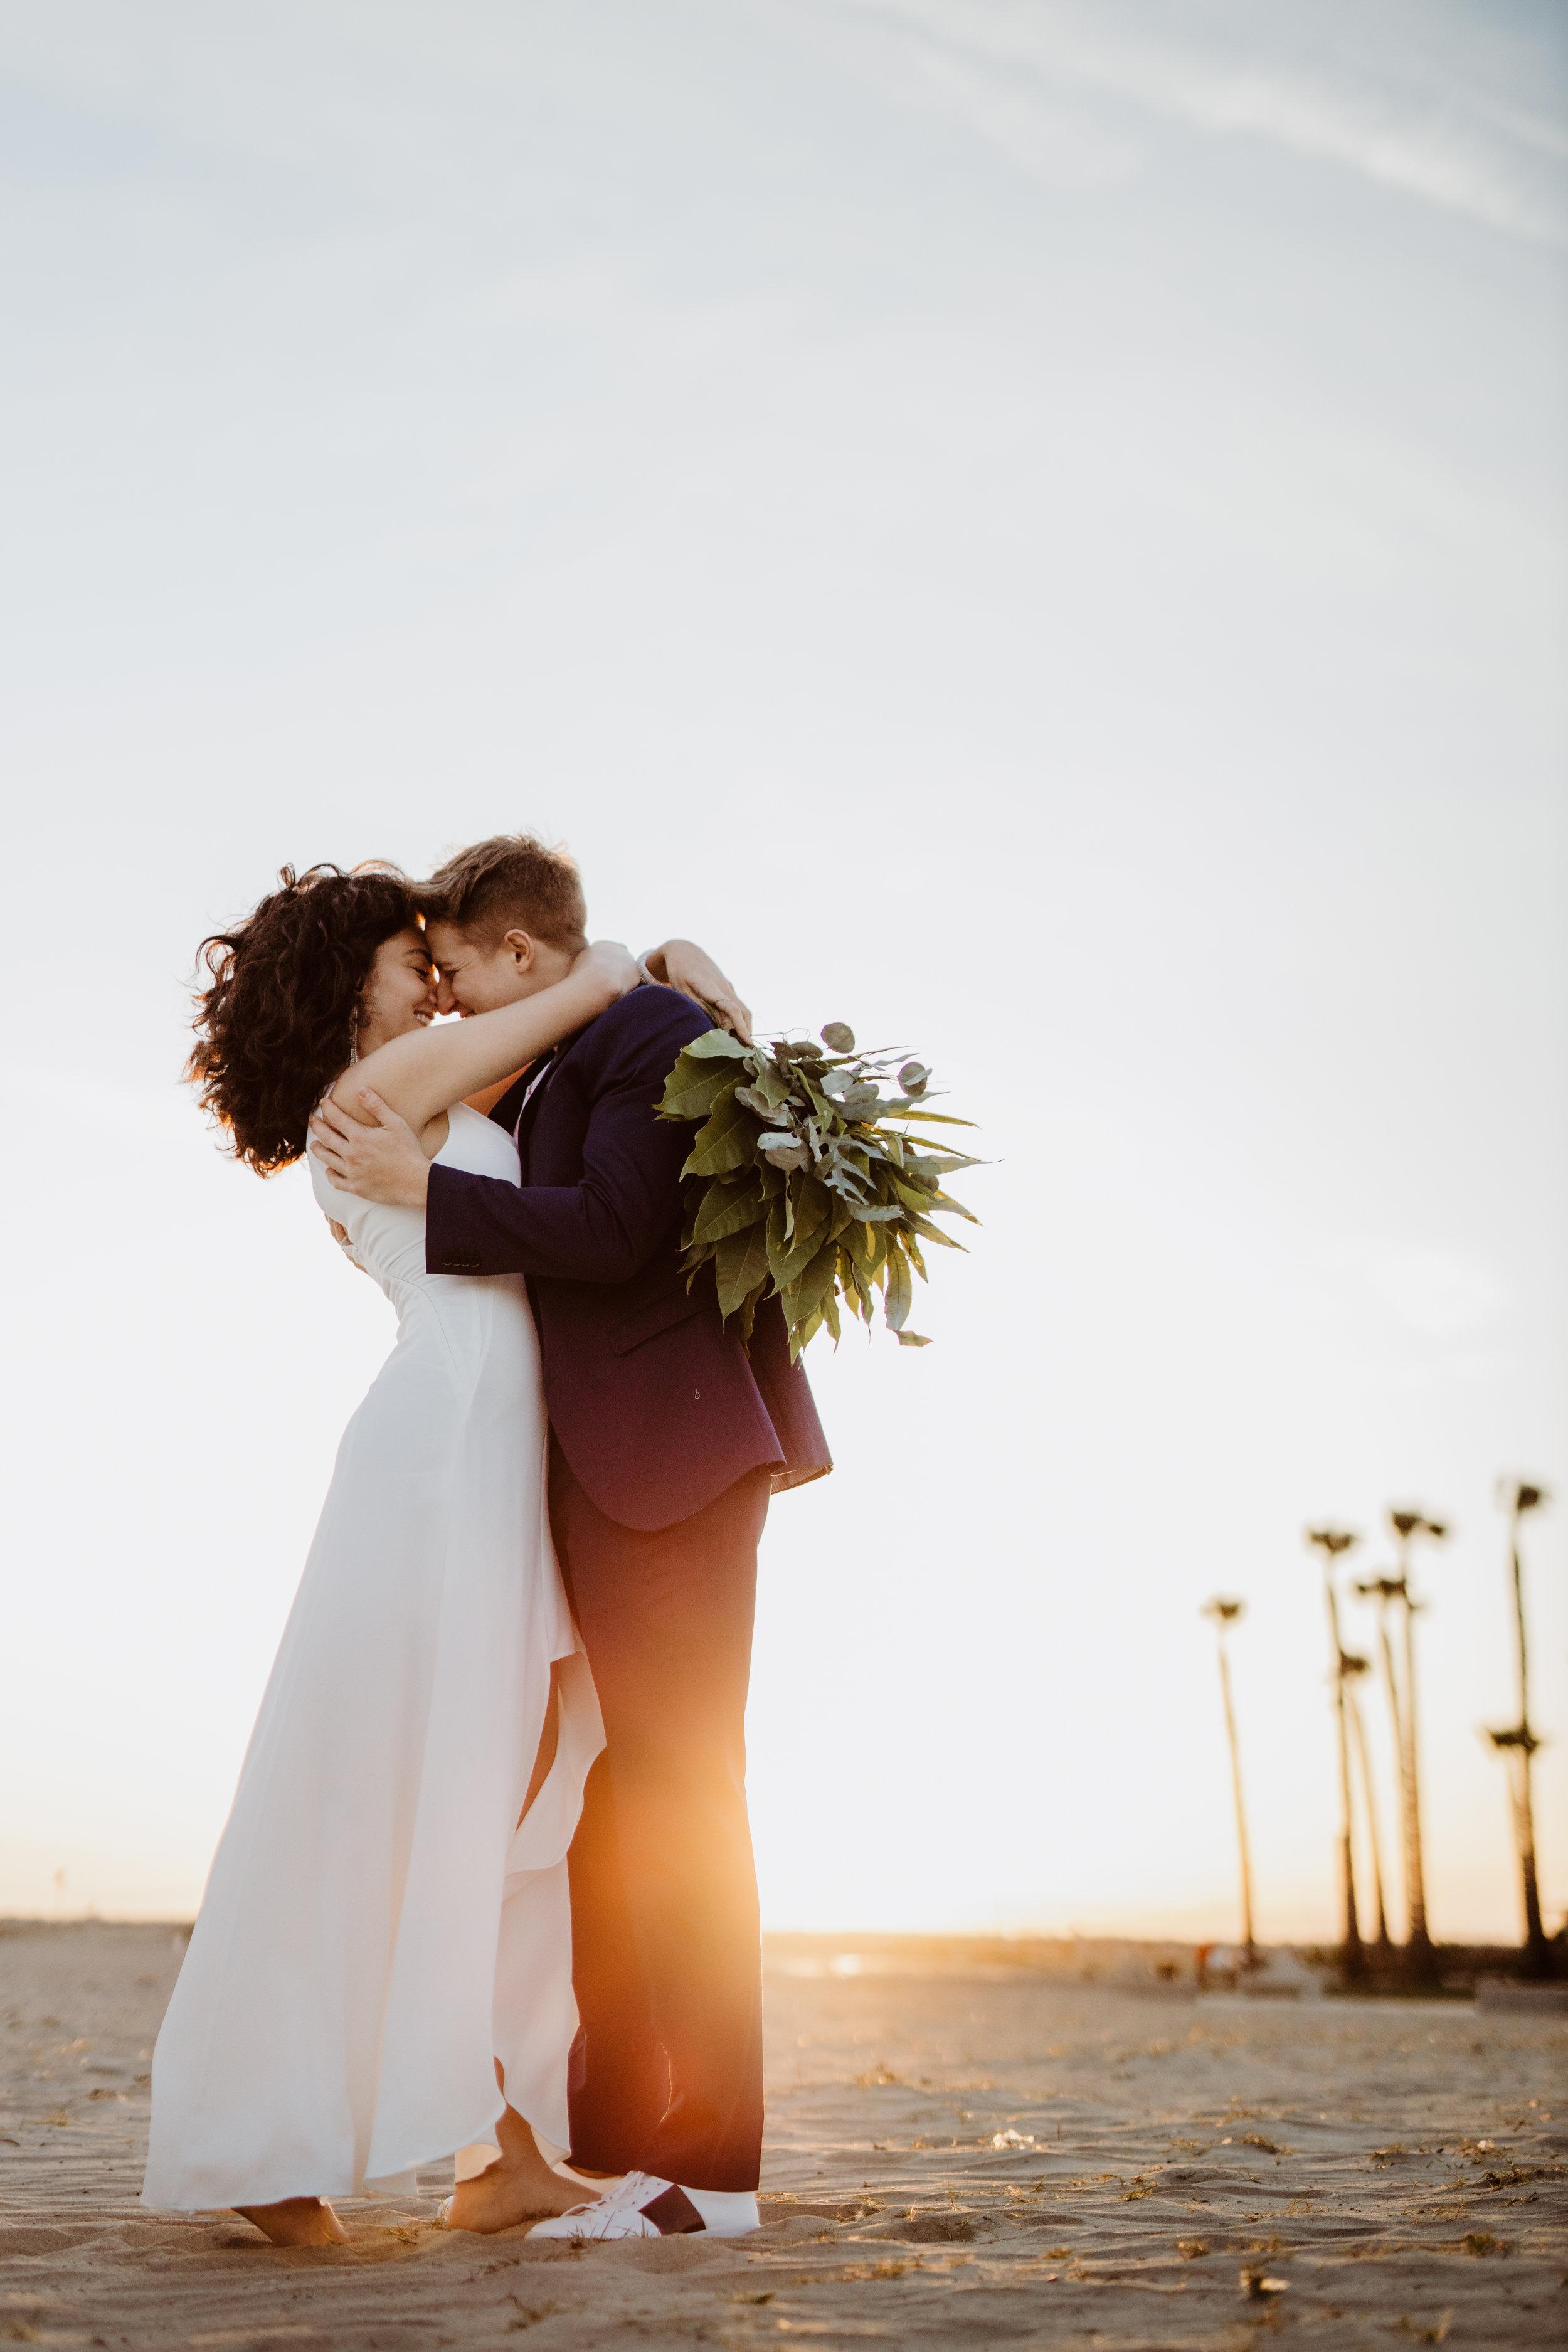 BEACH-COUPLES-ENGAGEMENT-8558.jpg